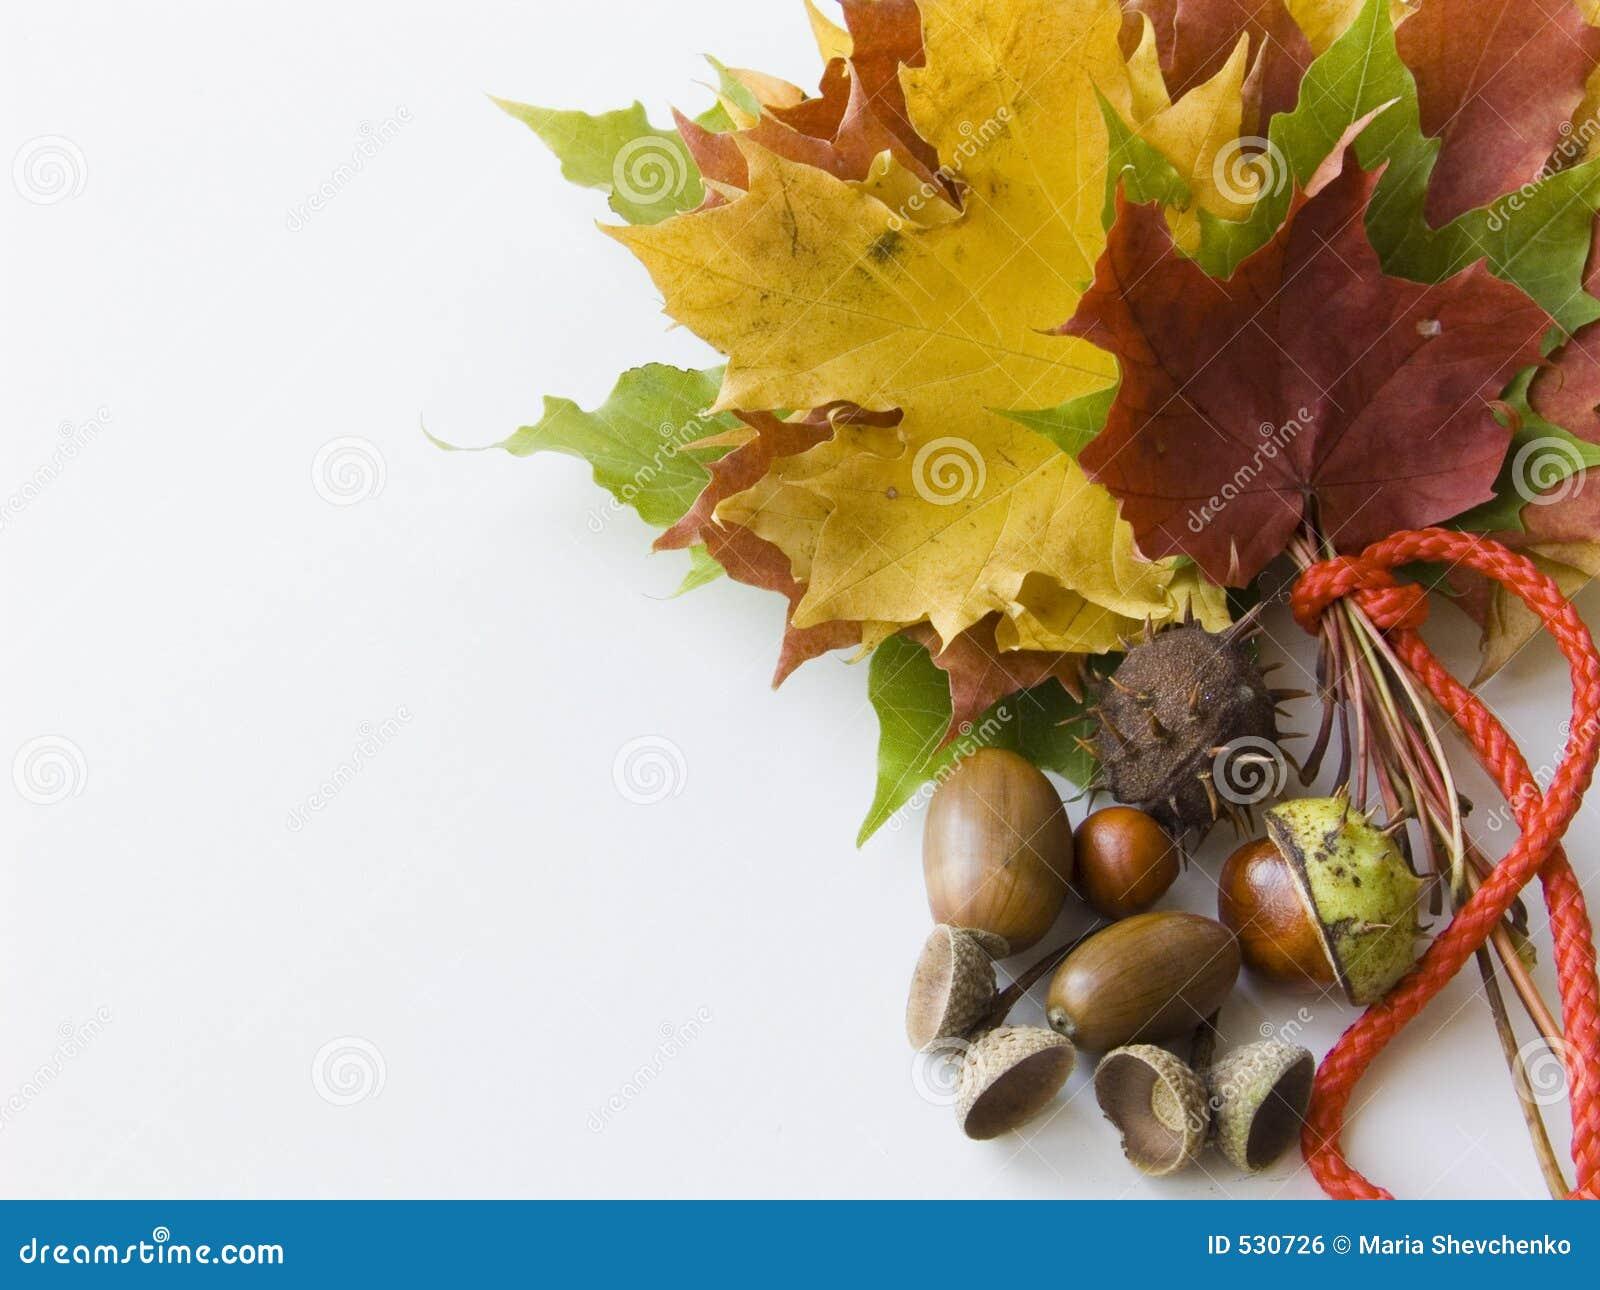 Download 秋天花束 库存照片. 图片 包括有 红色, 公园, 秋天, 栗子, 循环, 装饰, 自然, 叶子, 更改, 五颜六色 - 530726